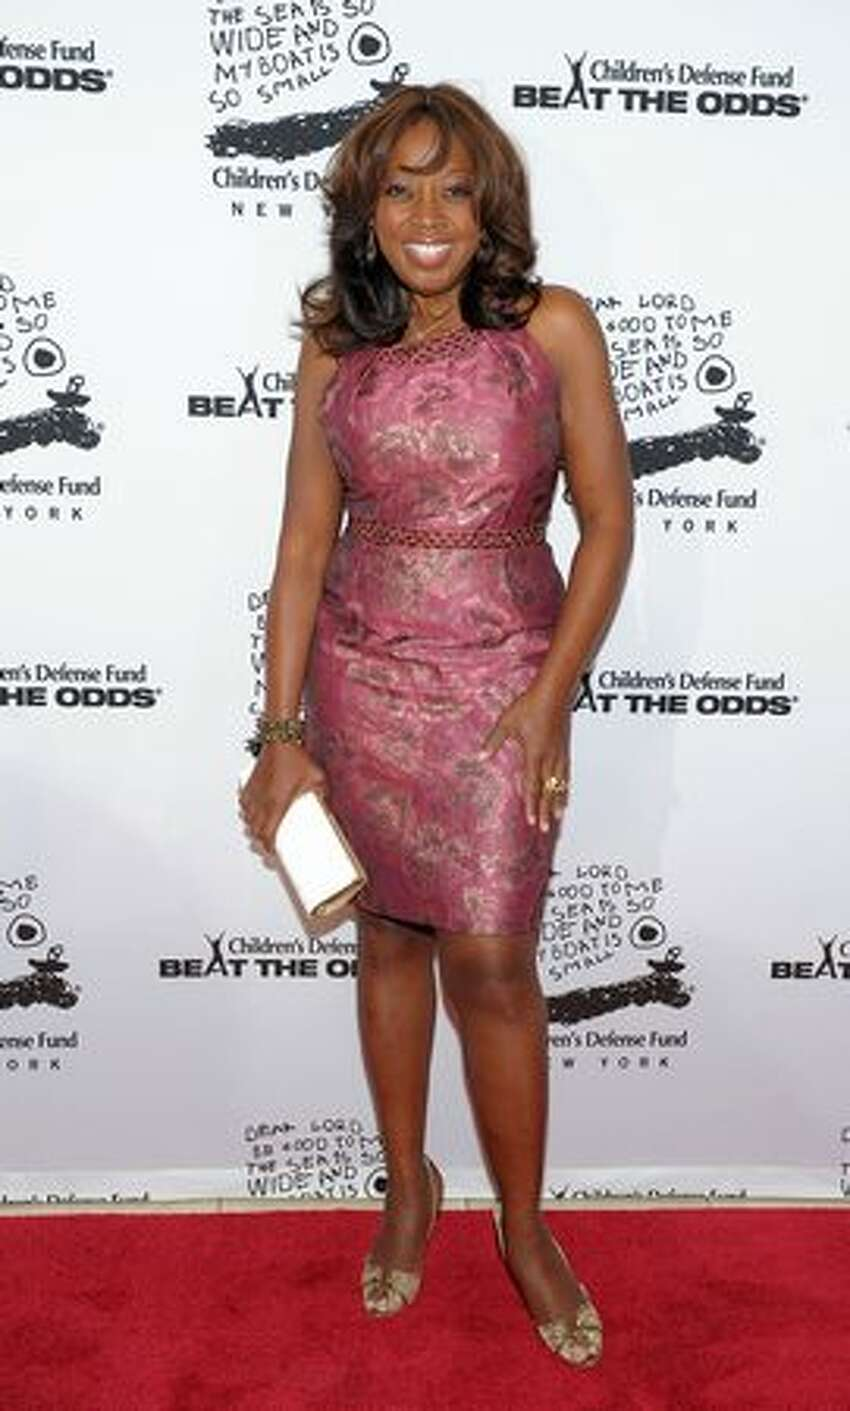 TV personality Star Jones now (2010).